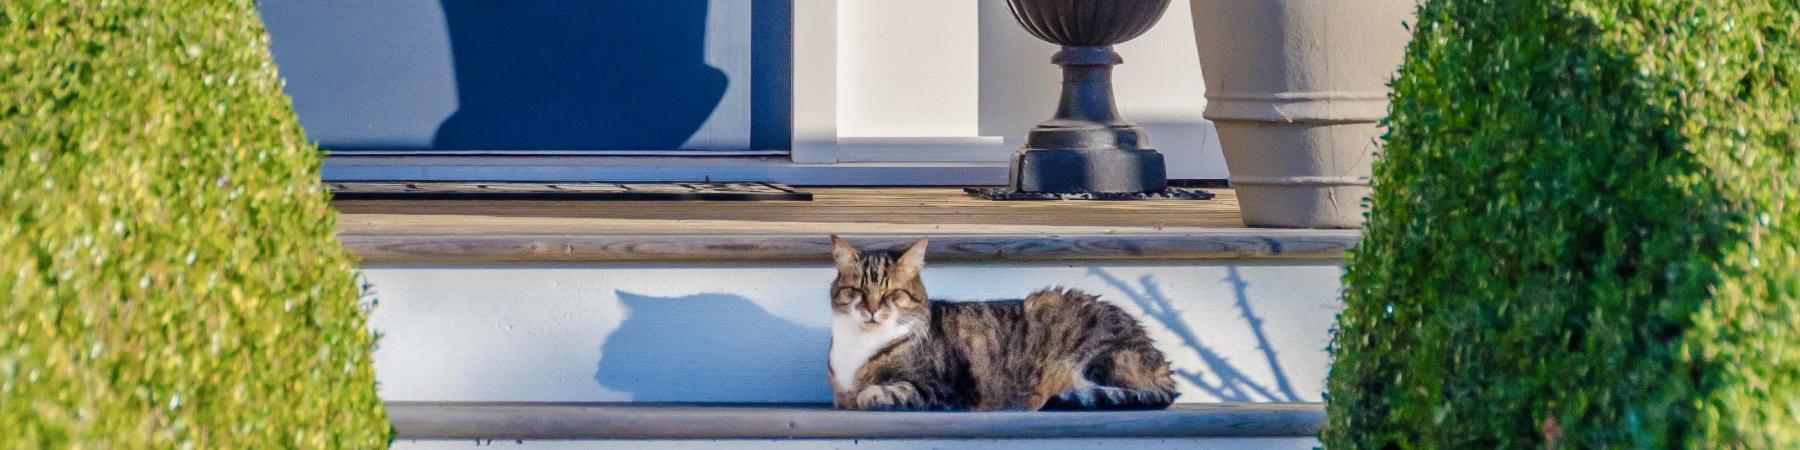 Blue front door porch cat on steps